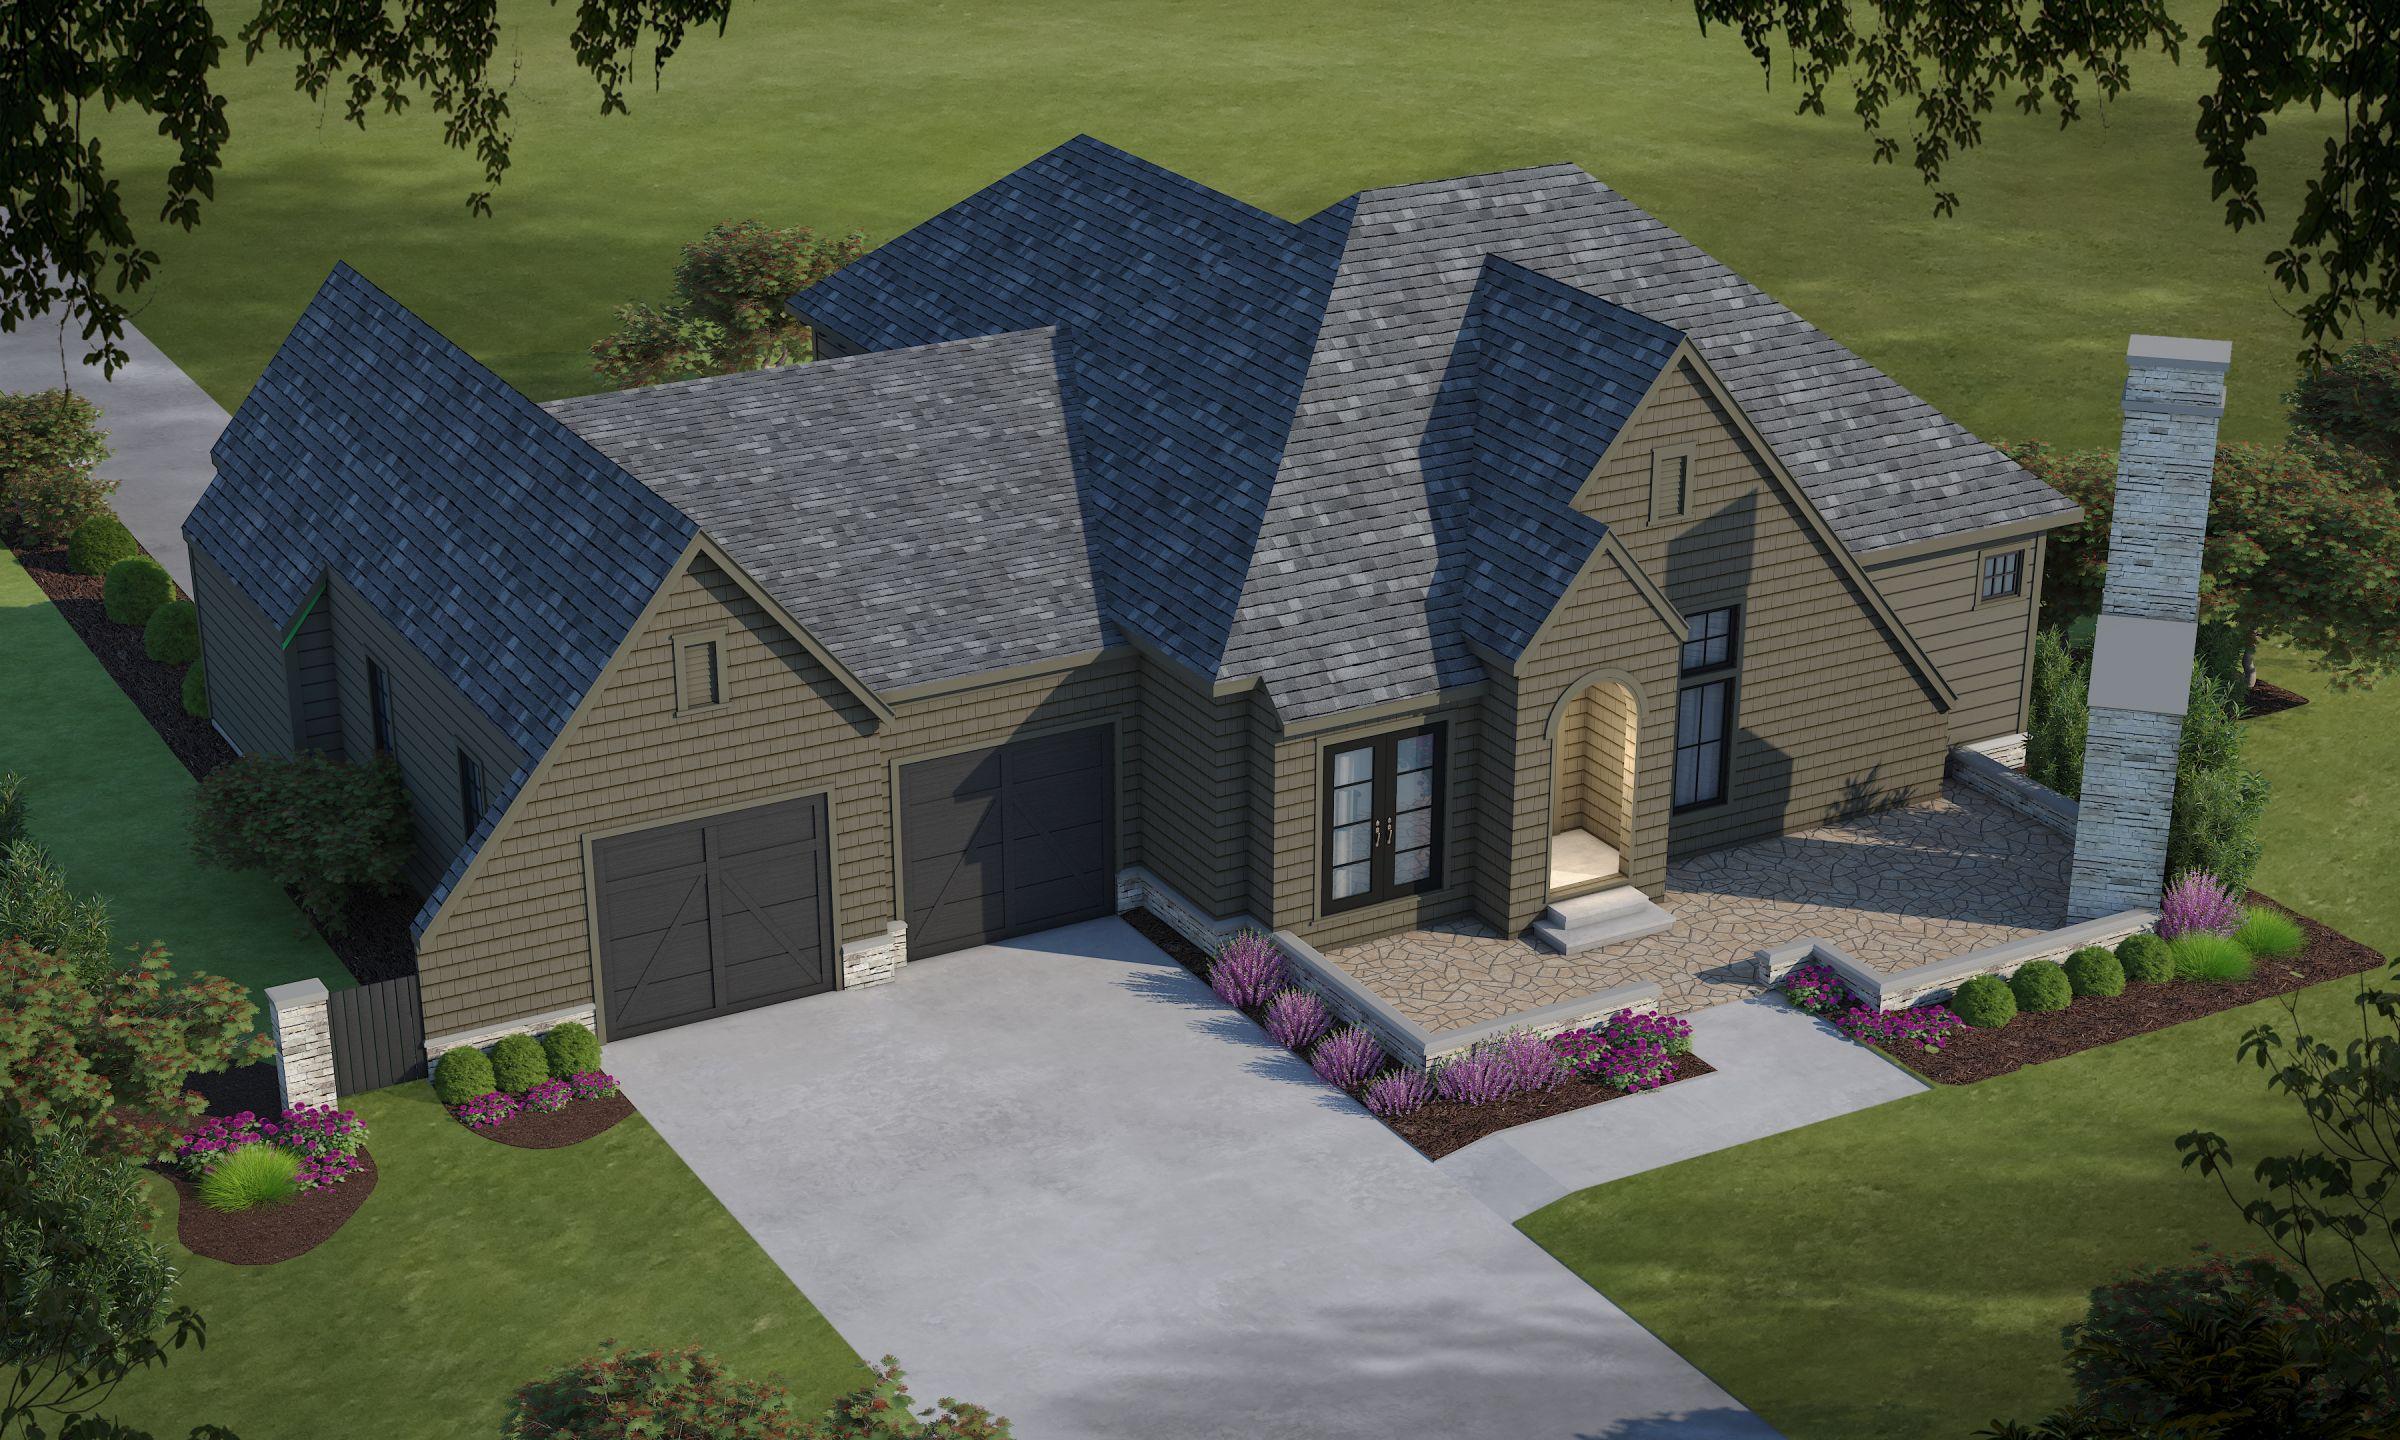 residential-warren-county-iowa-0-acres-listing-number-15598-0-2021-06-18-132744.jpg